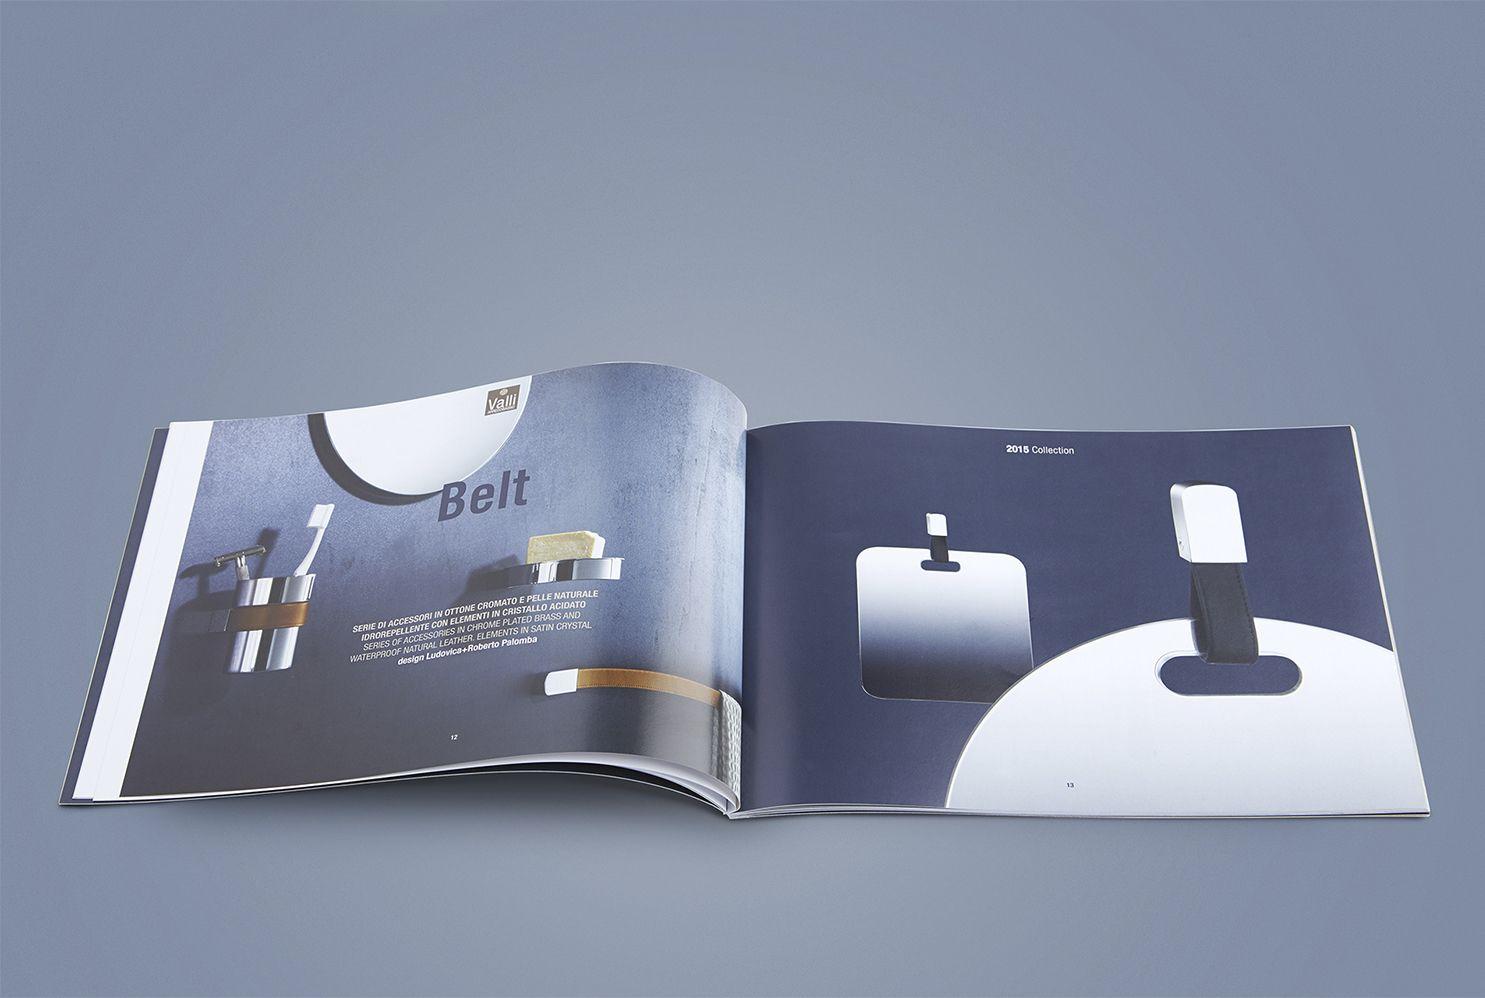 Valli Arredobagno ~ The new catalogue 2015 of valli arredobagno designed by hangar